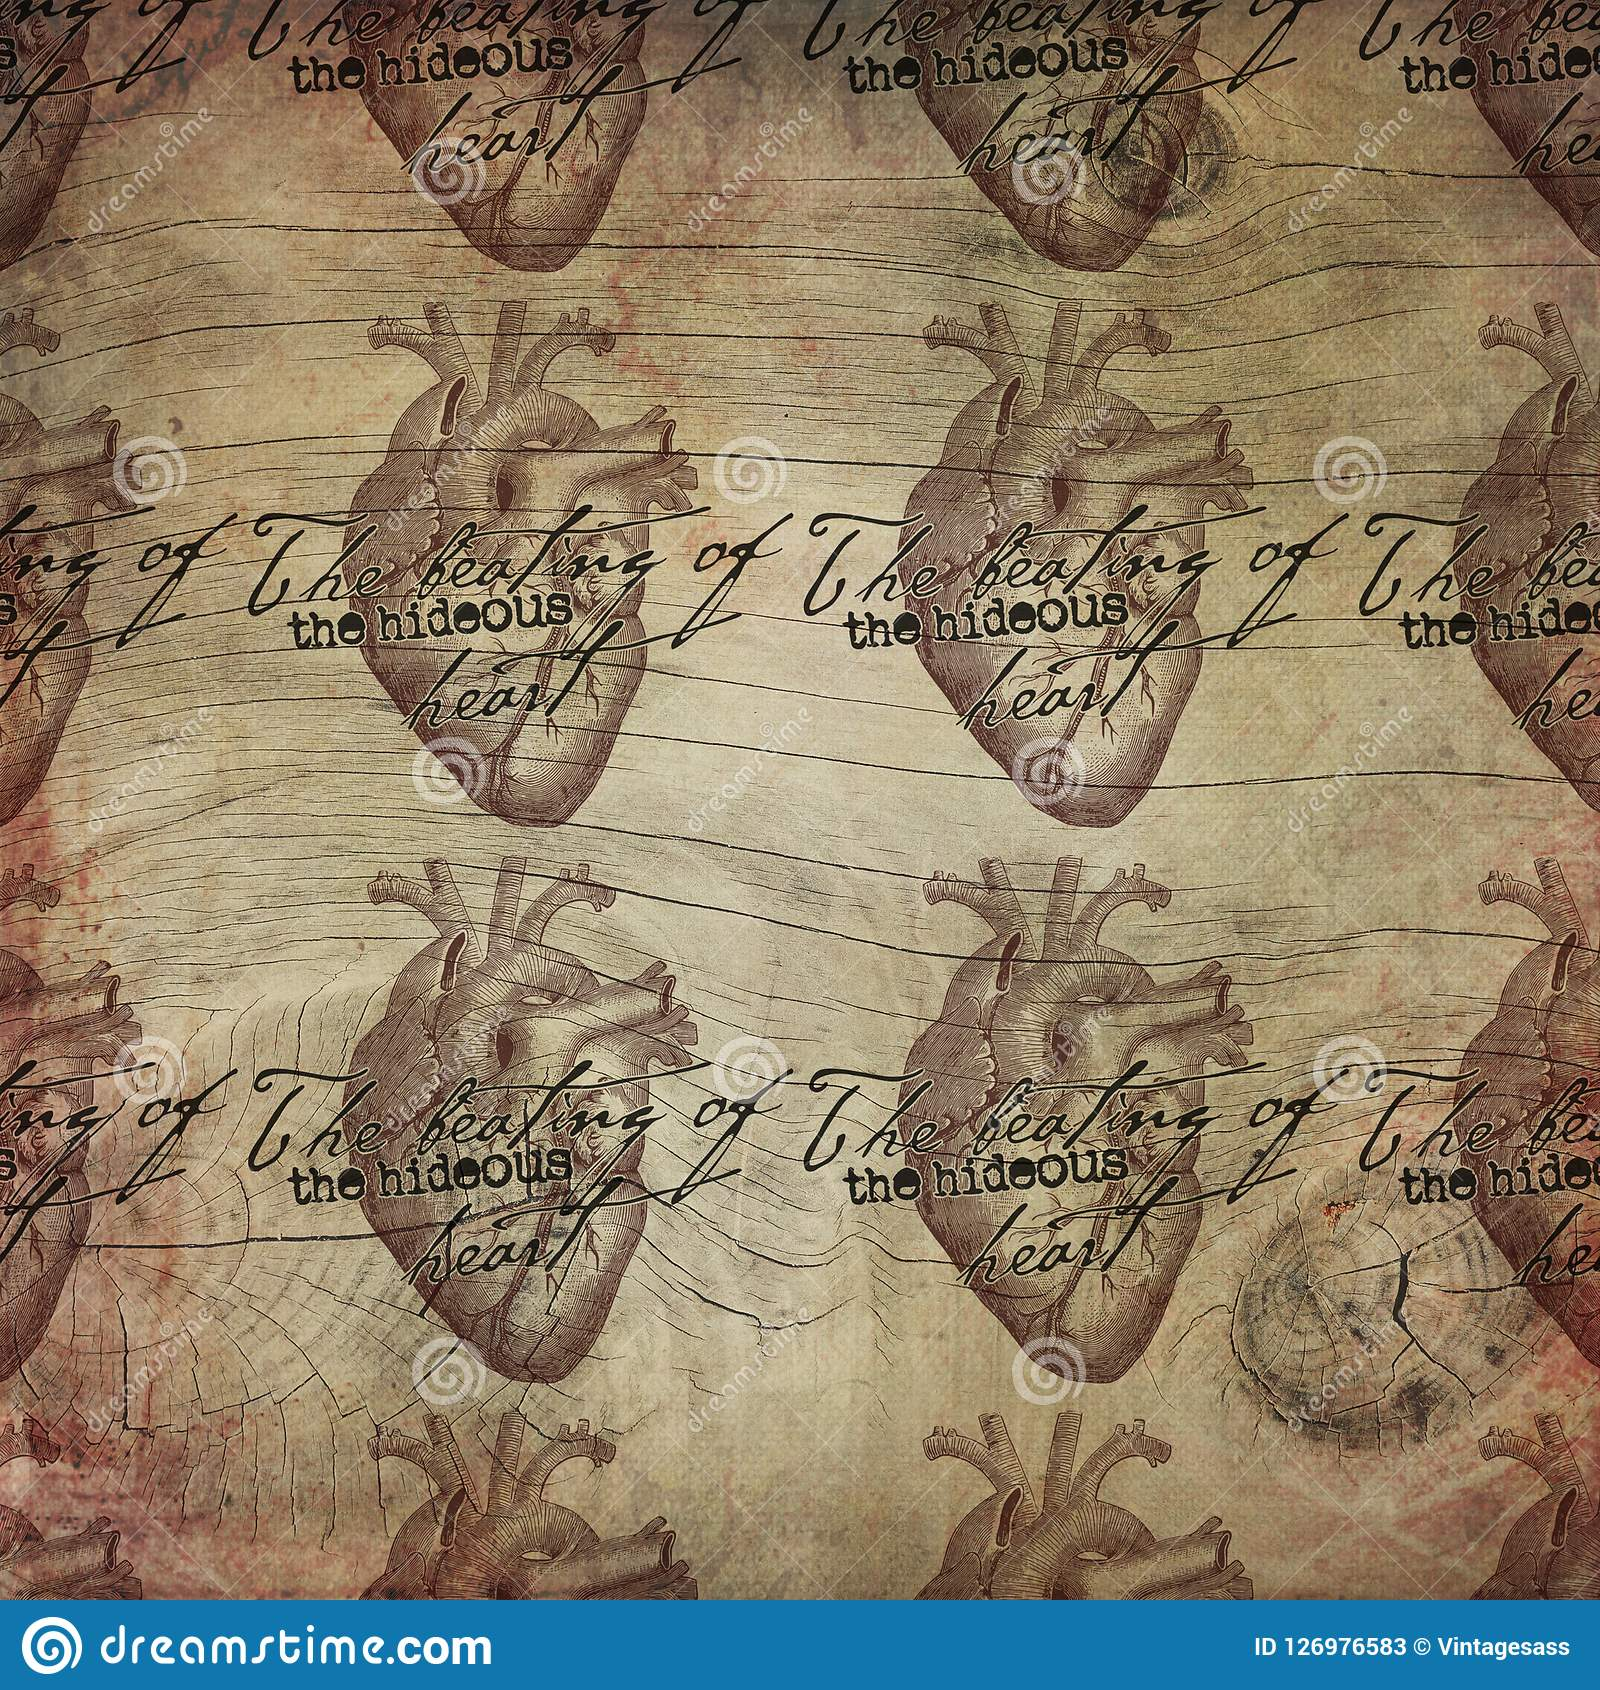 Edgar Allan Poe - skarżypyty serce - Makabryczny Halloween - got - Ciemny humor